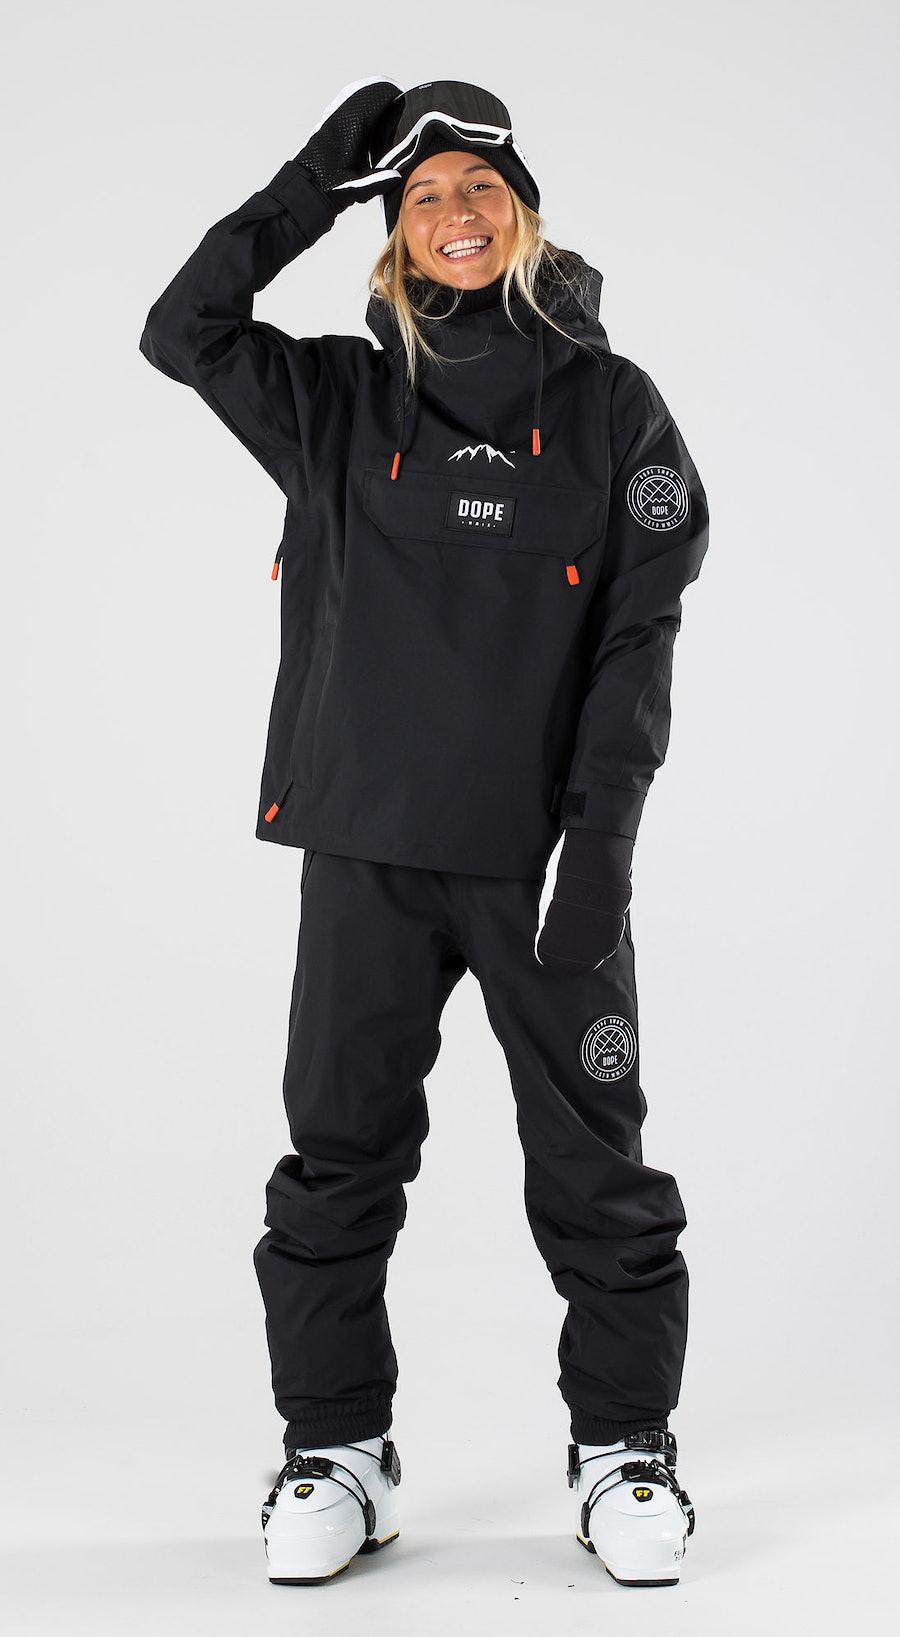 Dope Blizzard W Black Skibekleidung Multi